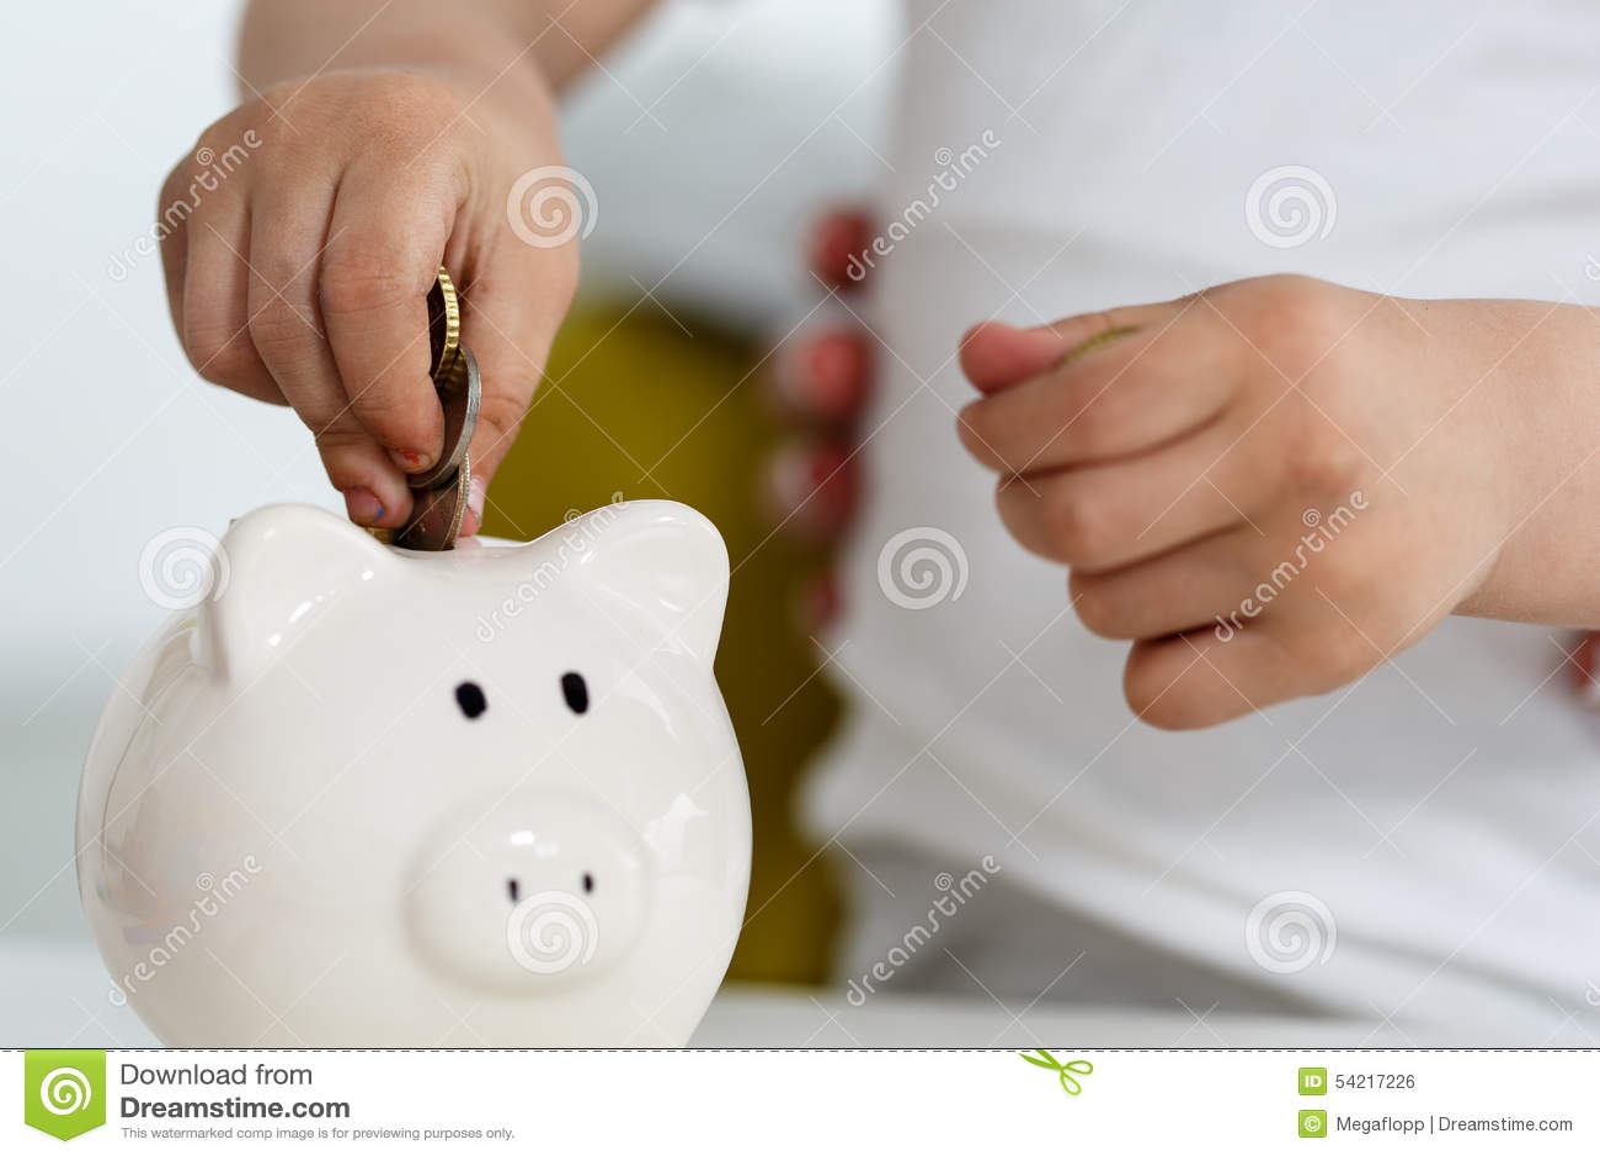 child s hand put into white piggybank money coins  royalty